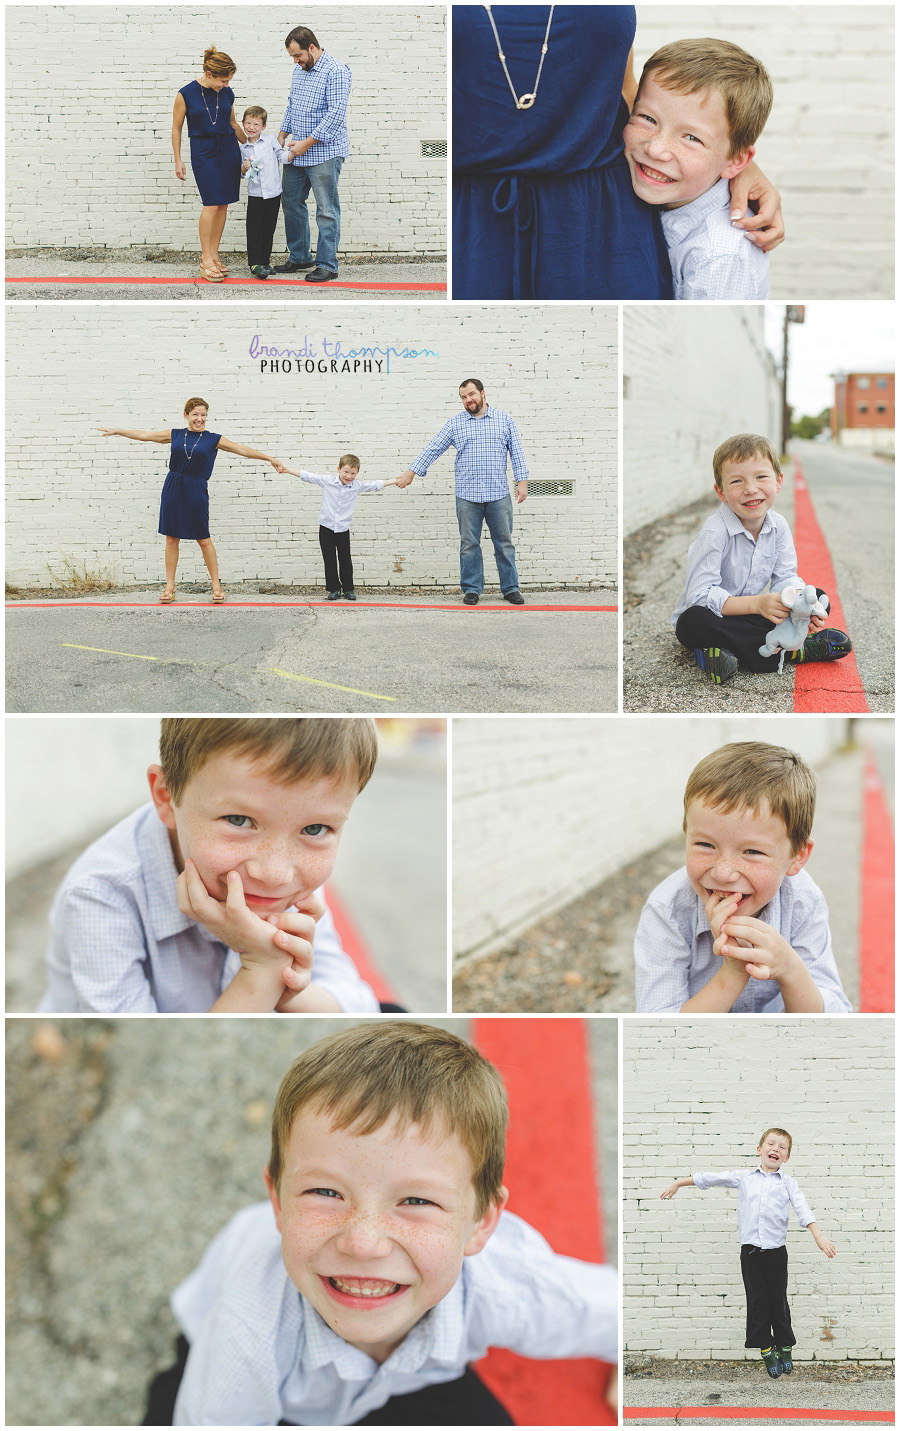 family photos in downtown mckinney, tx